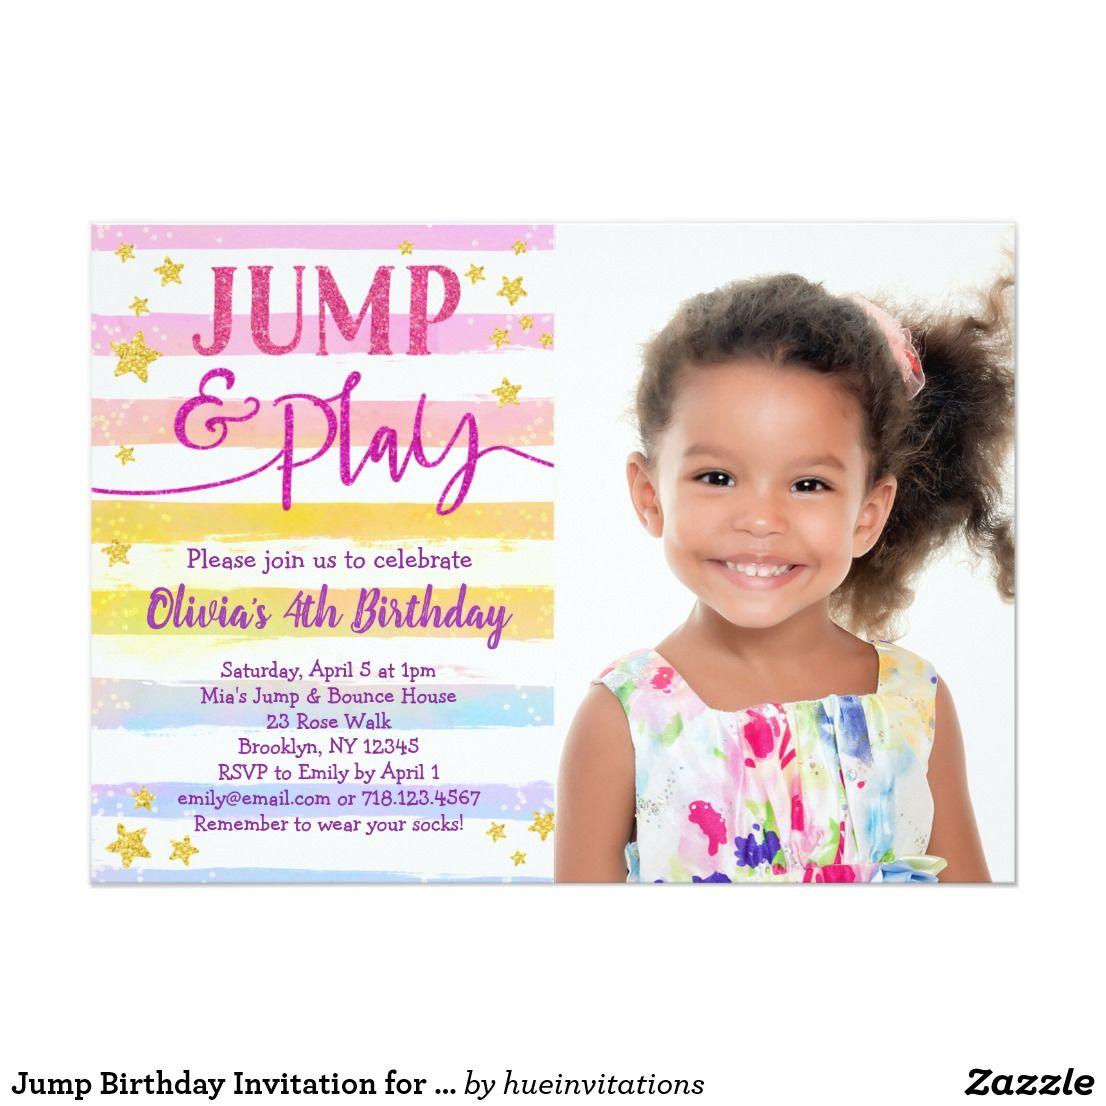 Jump Birthday Invitation for Girls Bounce Party | Hue Invitations ...